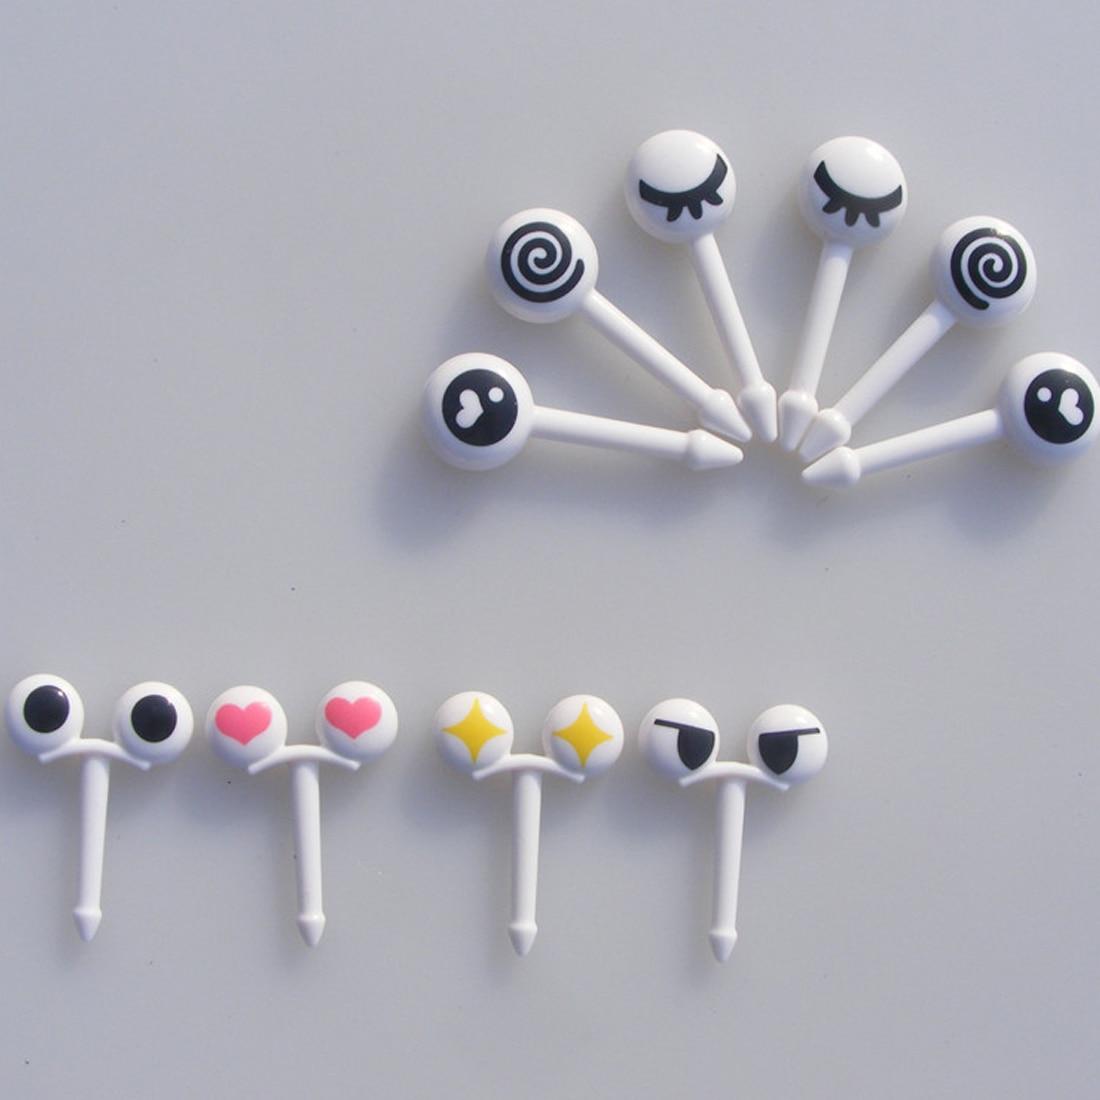 Pop 10PCs/ Lot Cute Plastic Fruit Toothpick Lovely Eye Cartoon Forks Bento Decorative Tableware Food Picks Fish Fork Dessert